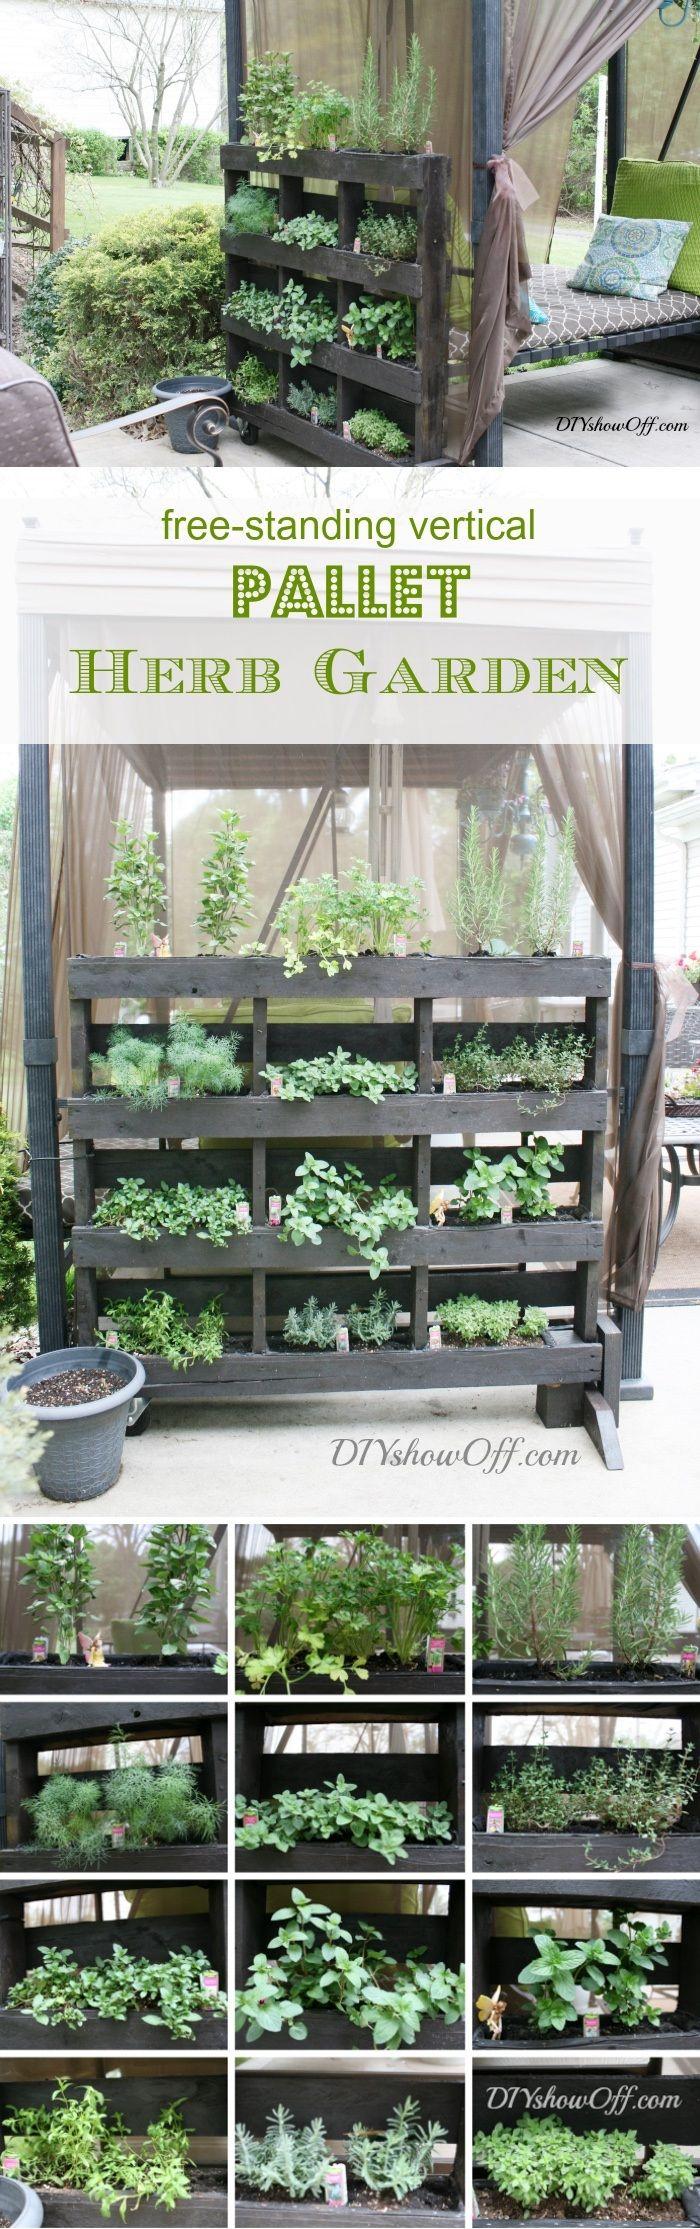 19 Inspiring DIY Pallet Planter Ideas | Pinterest | Pallet herb ...